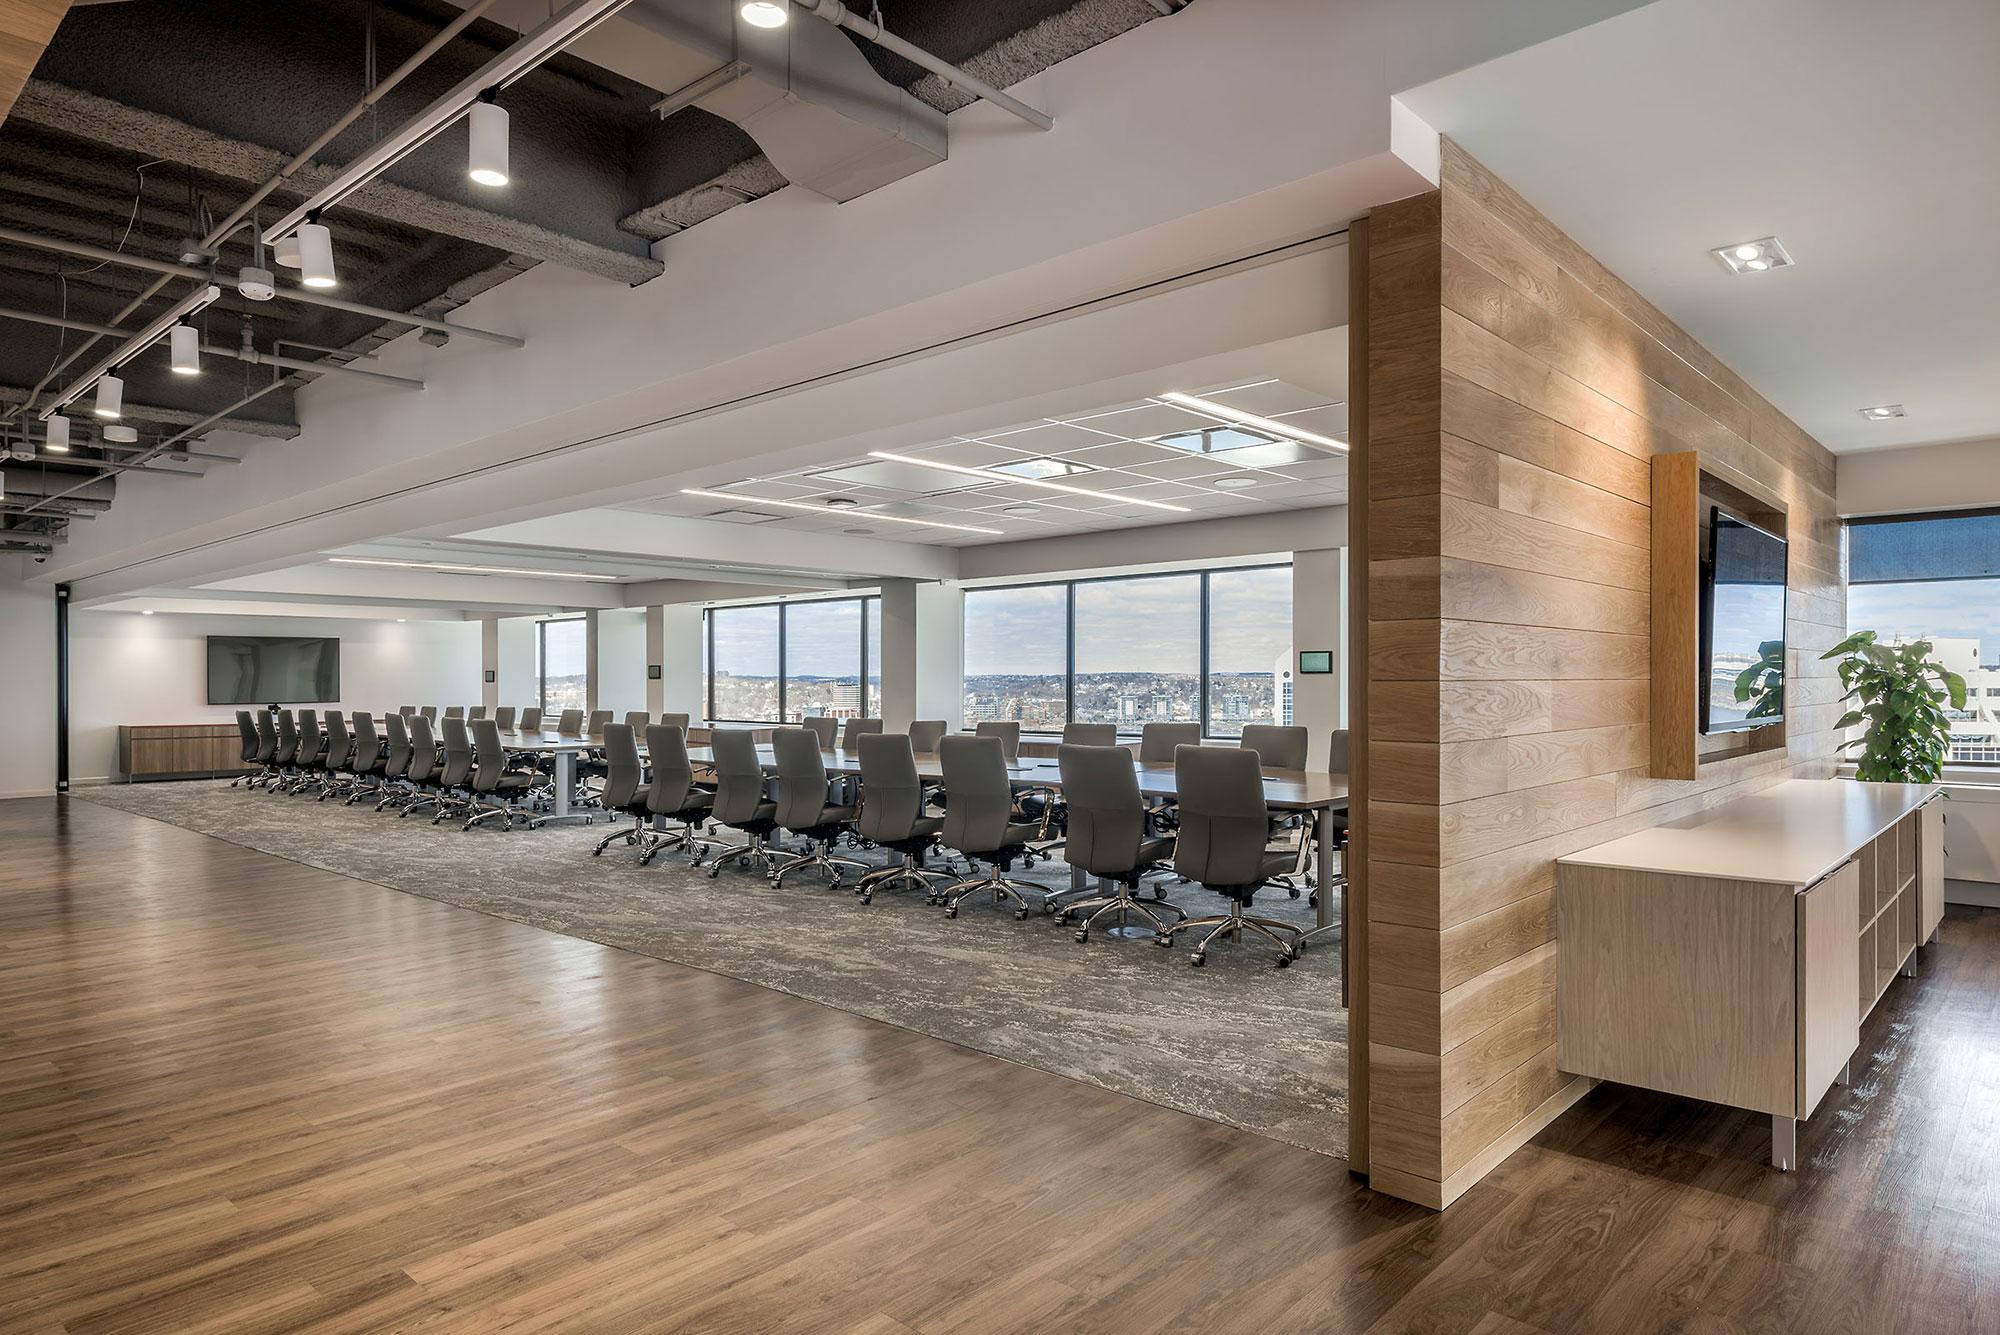 interior-design-financial-services-boardroom-chairs.jpg